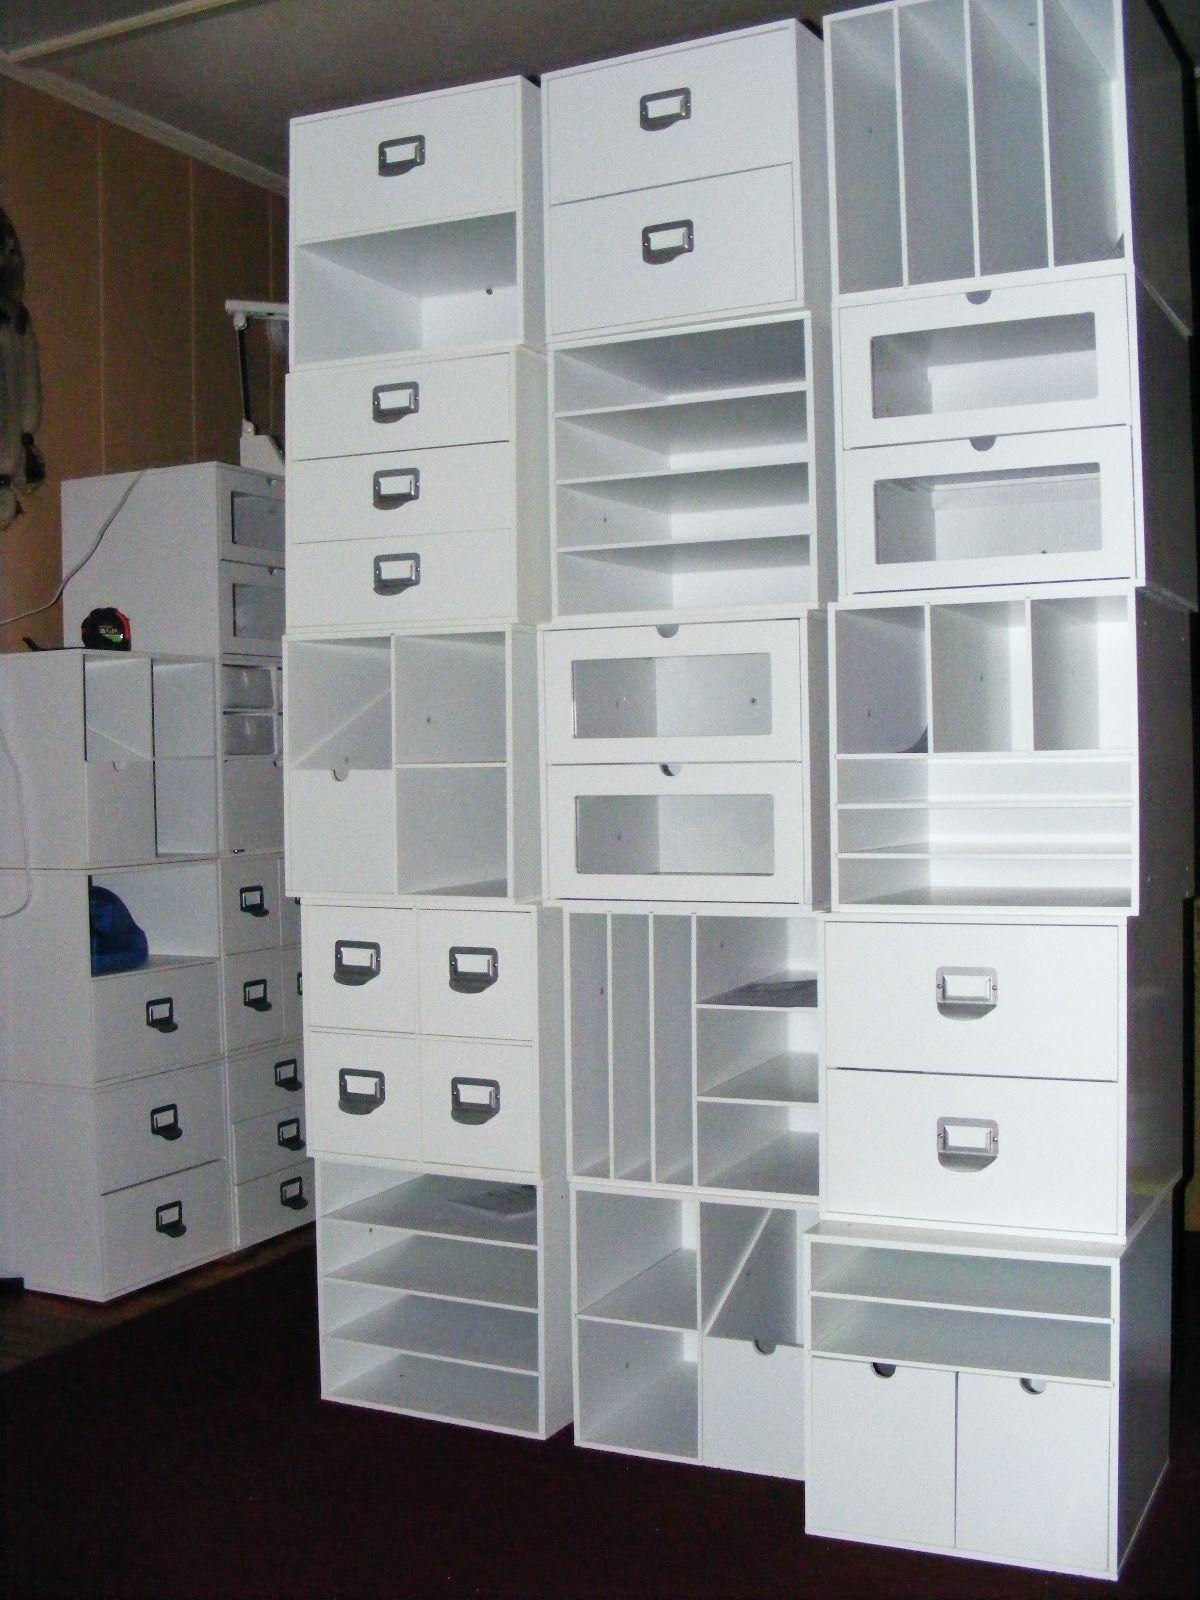 Scrapbook room storage ideas - More New Storage Cubes From M S Scrapbook Com